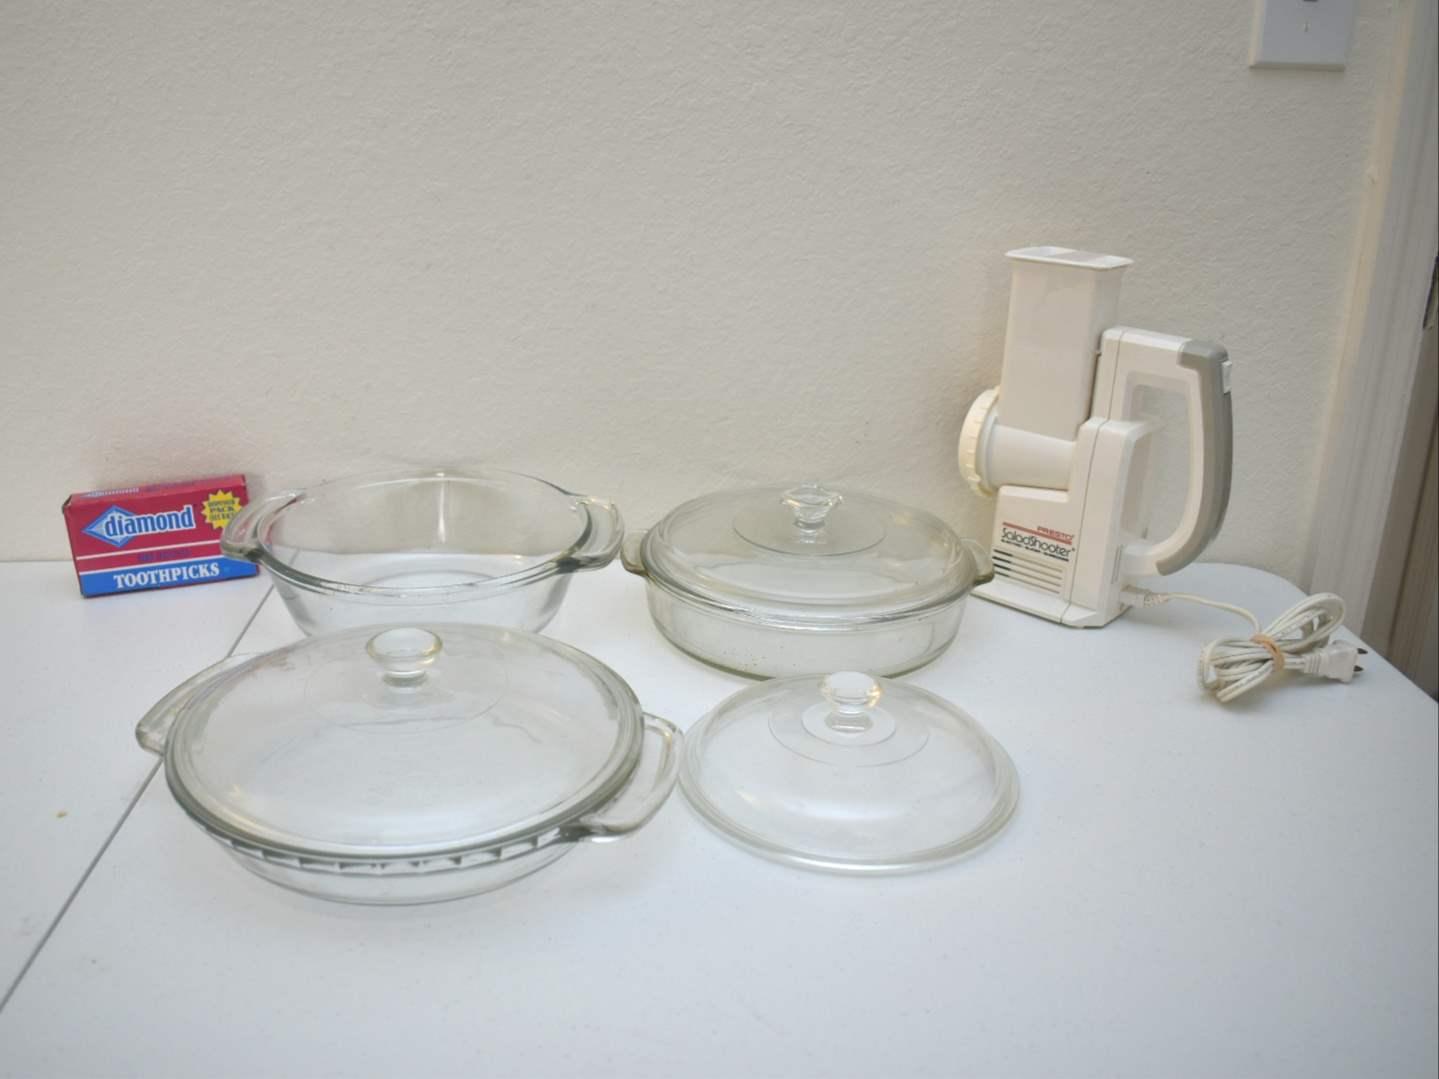 Anchorware & Pyrex Bowls, Toothpicks, Presto Saladshooter